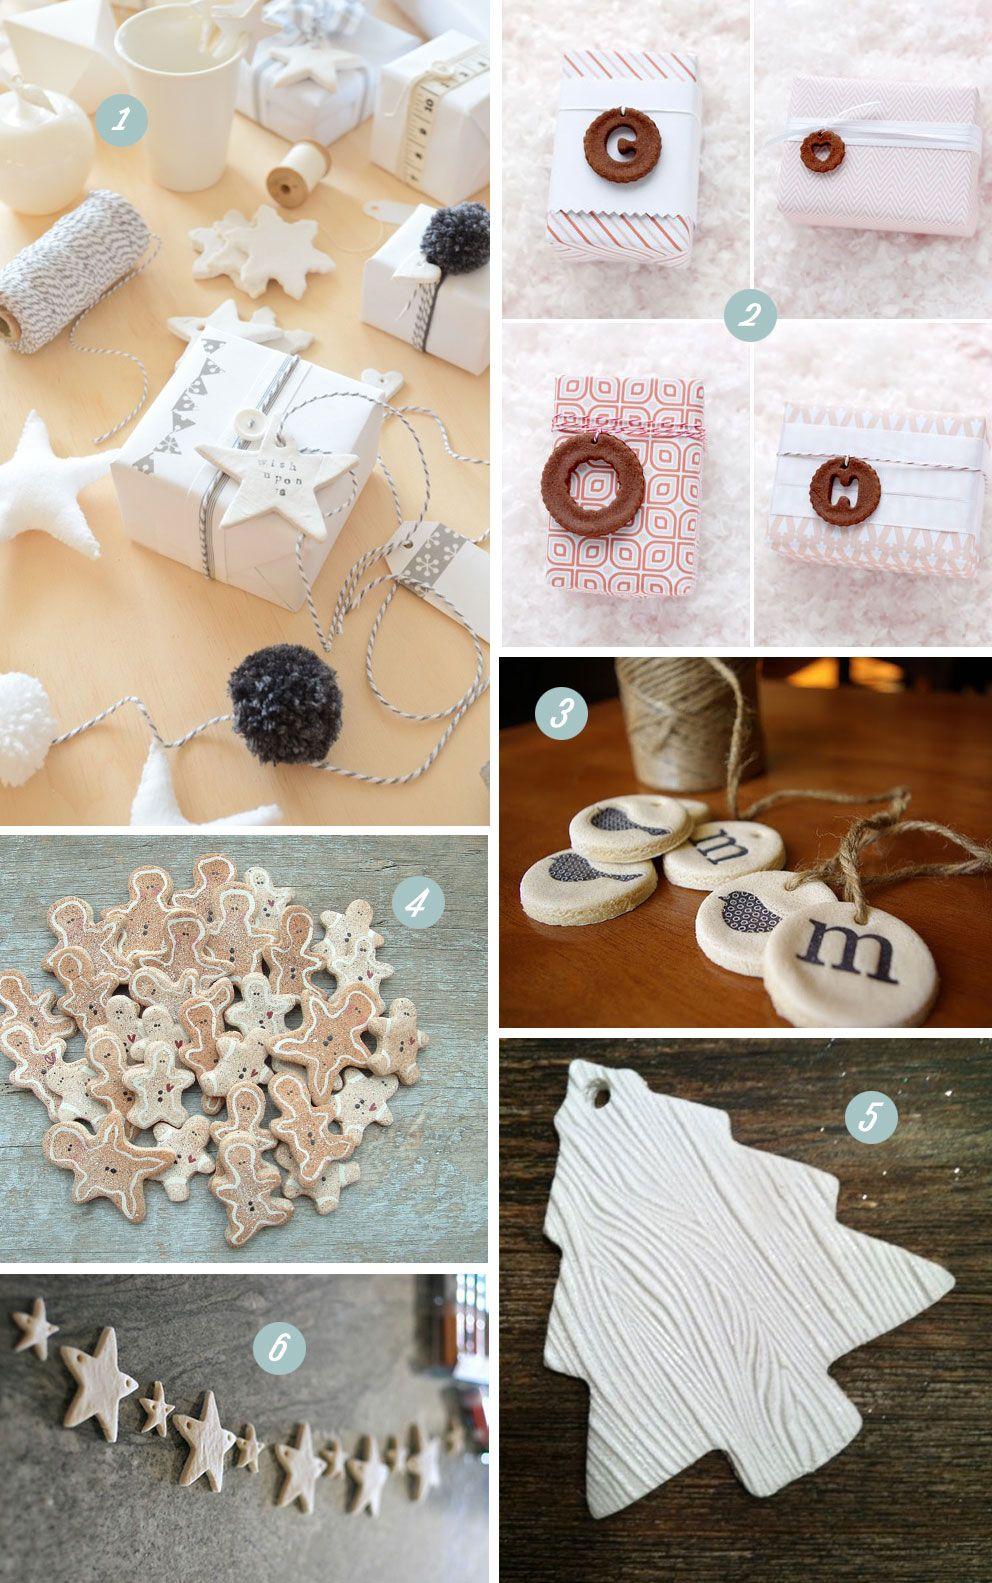 Diy salt dough christmas ornaments gift tags bonjour berry diy salt dough christmas ornaments gift tags bonjour berry solutioingenieria Gallery